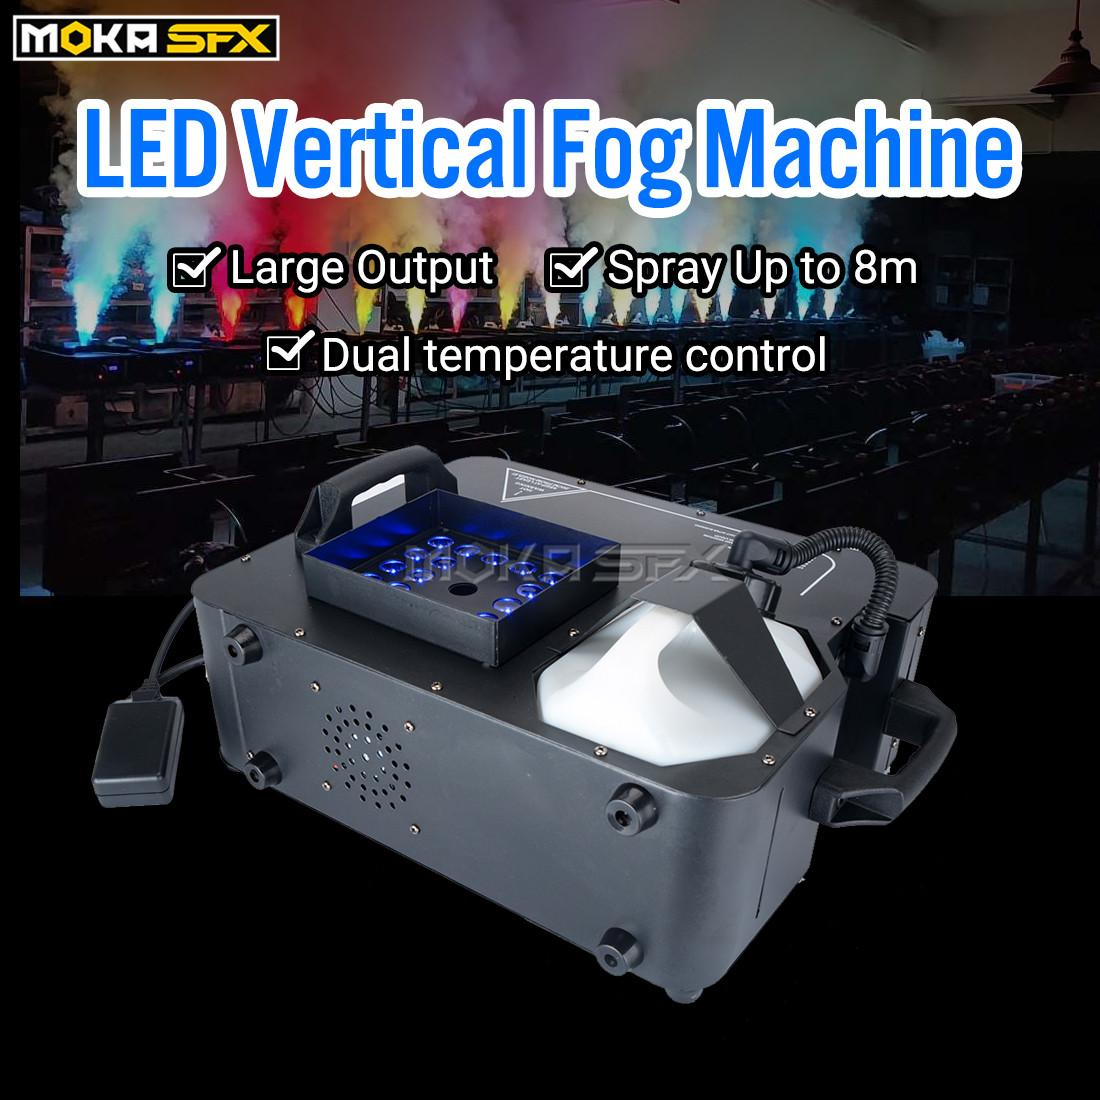 24 * 1W RGB LED 안개 기계 DMX 스프레이 수직 연기 기계 1500W 무대 효과 Fogger 기계 파티 클럽 할로윈 장식